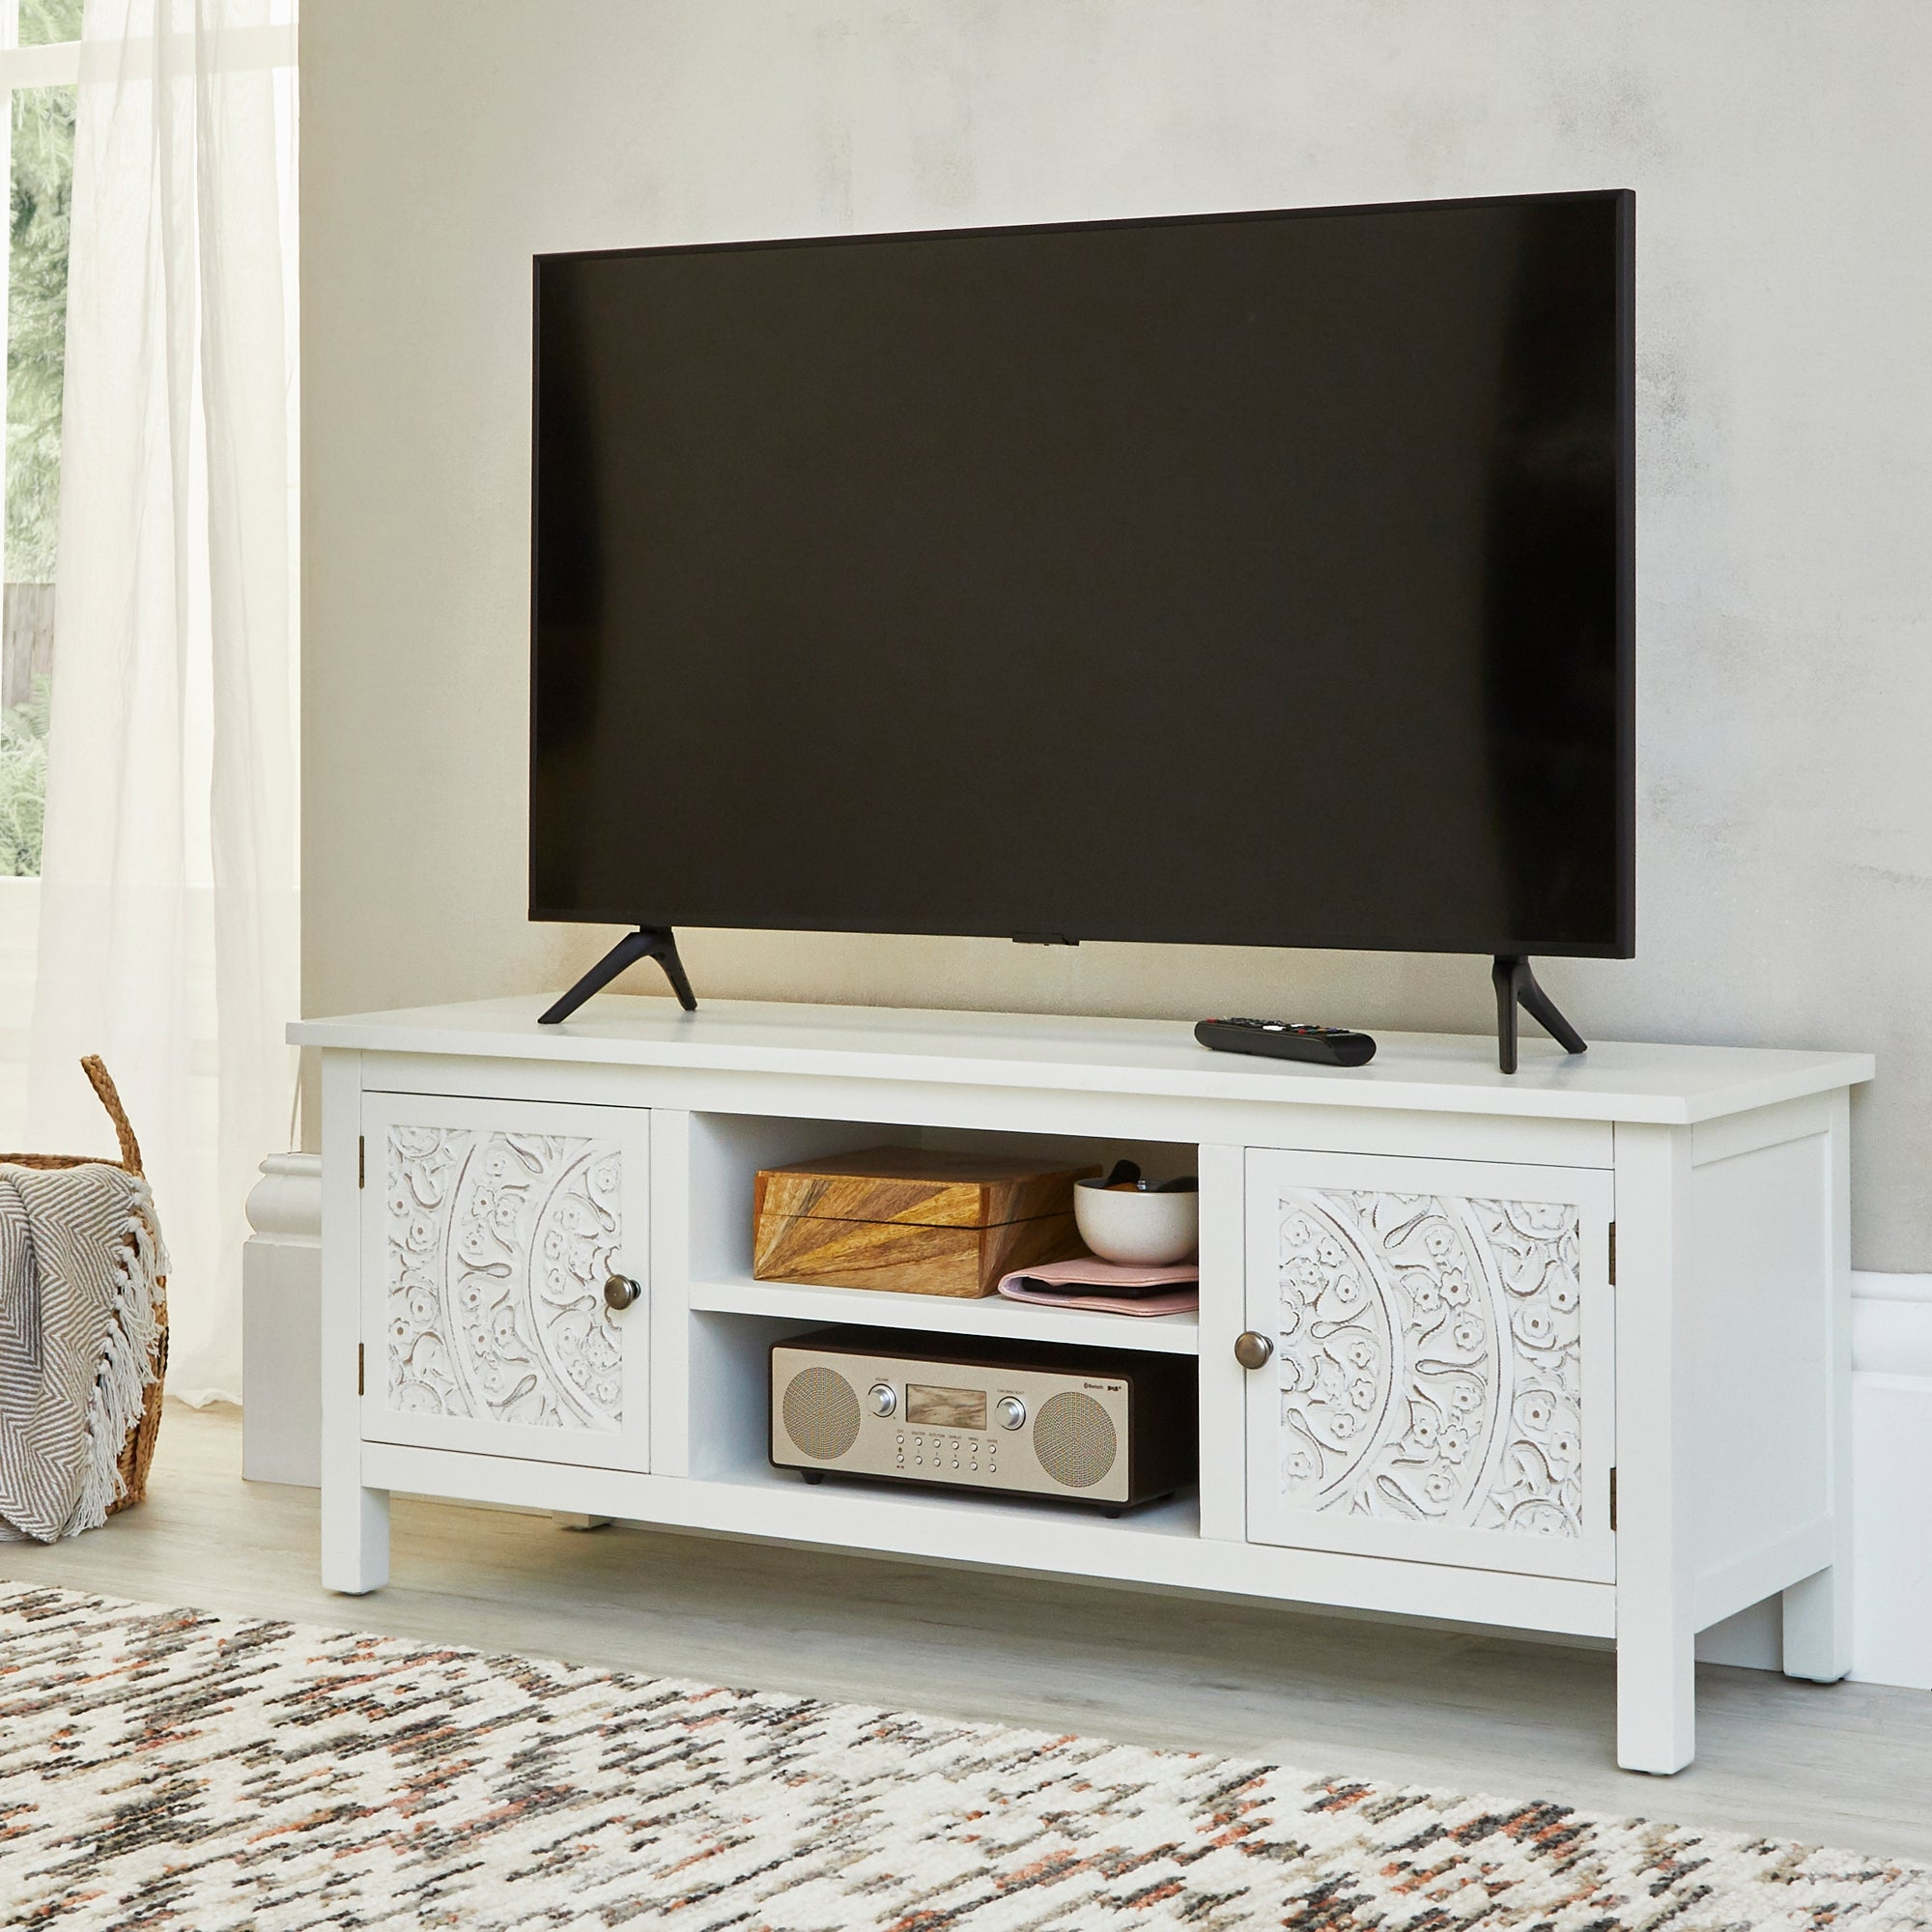 Dunelm Samira TV Stand White 47x120x38cm